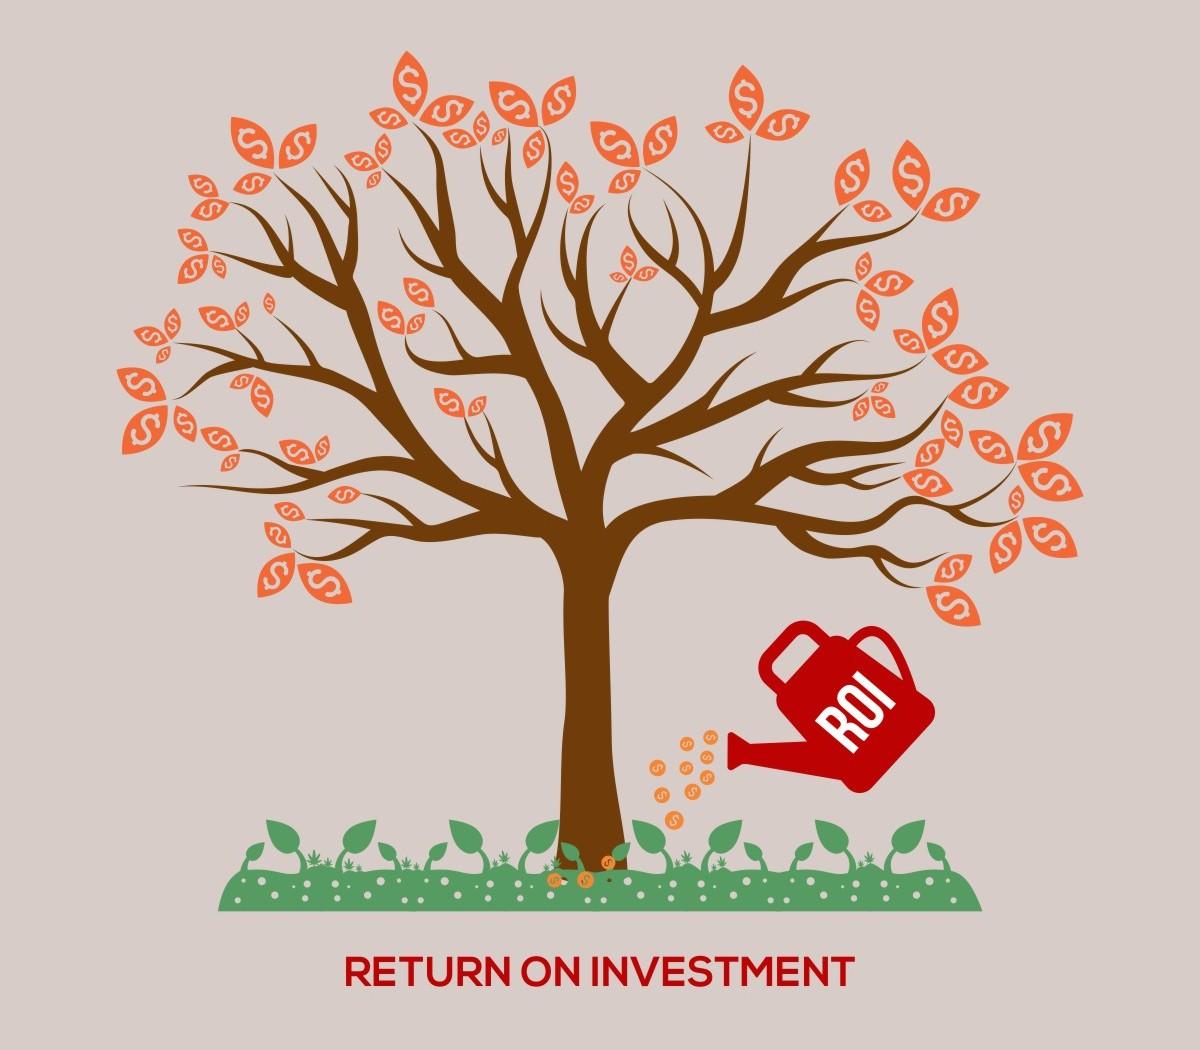 ROI return of investment tree